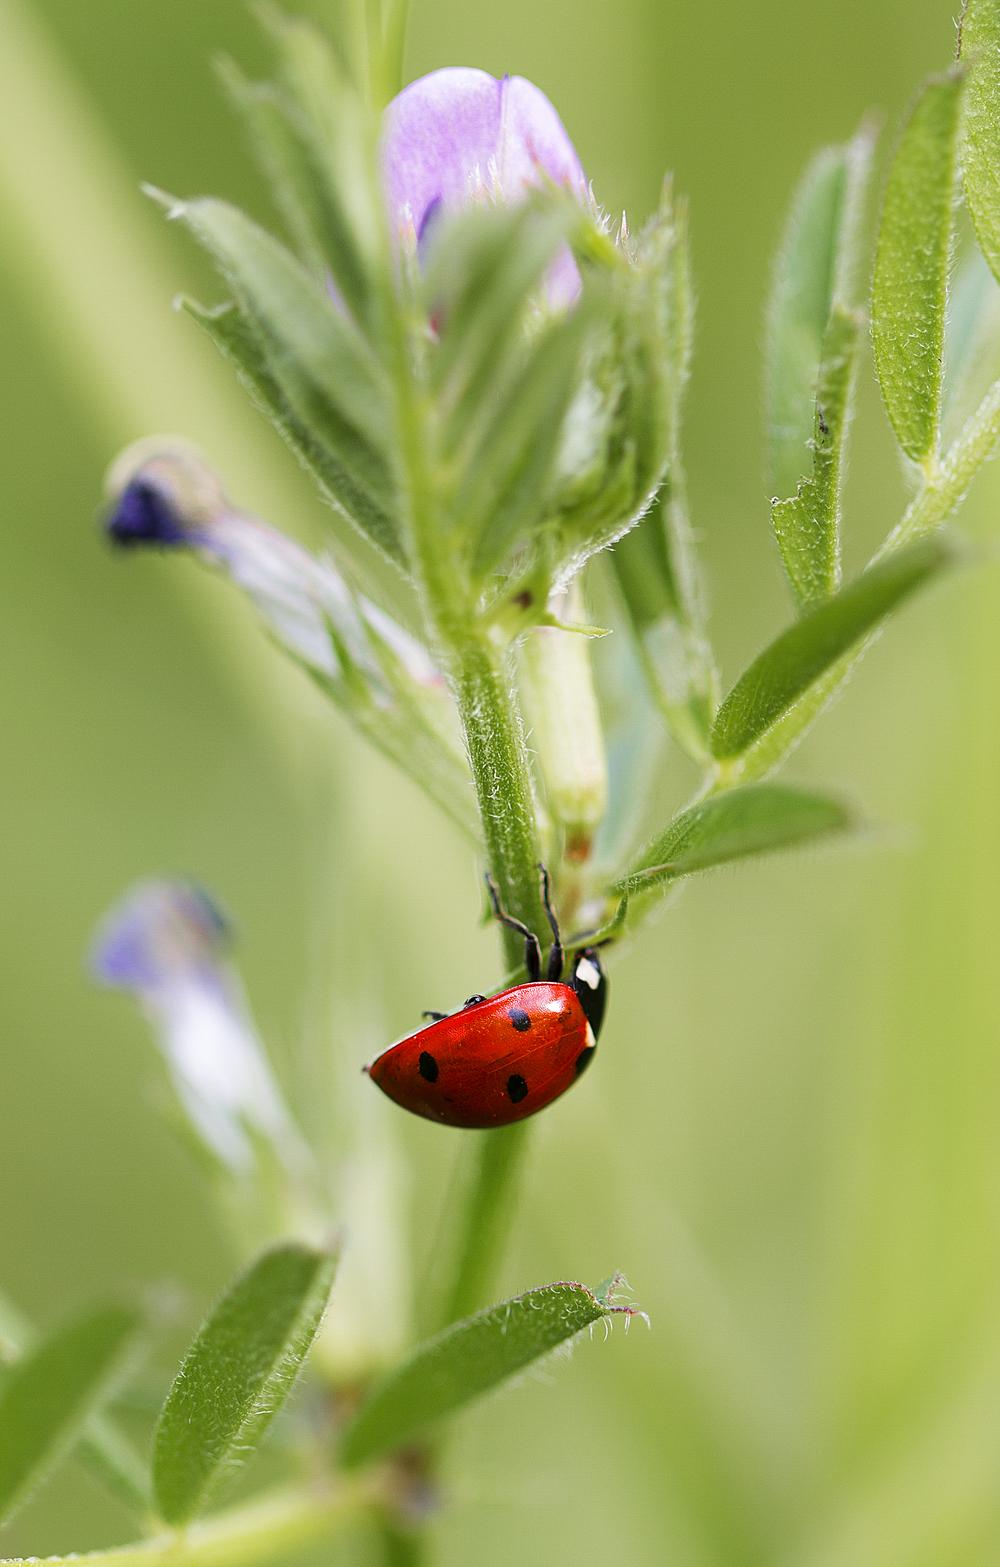 The plant's friend the aphids enemy Read about The Coccinellidae (/ˌkɒksɪˈnɛlɪdaɪ/) Comments